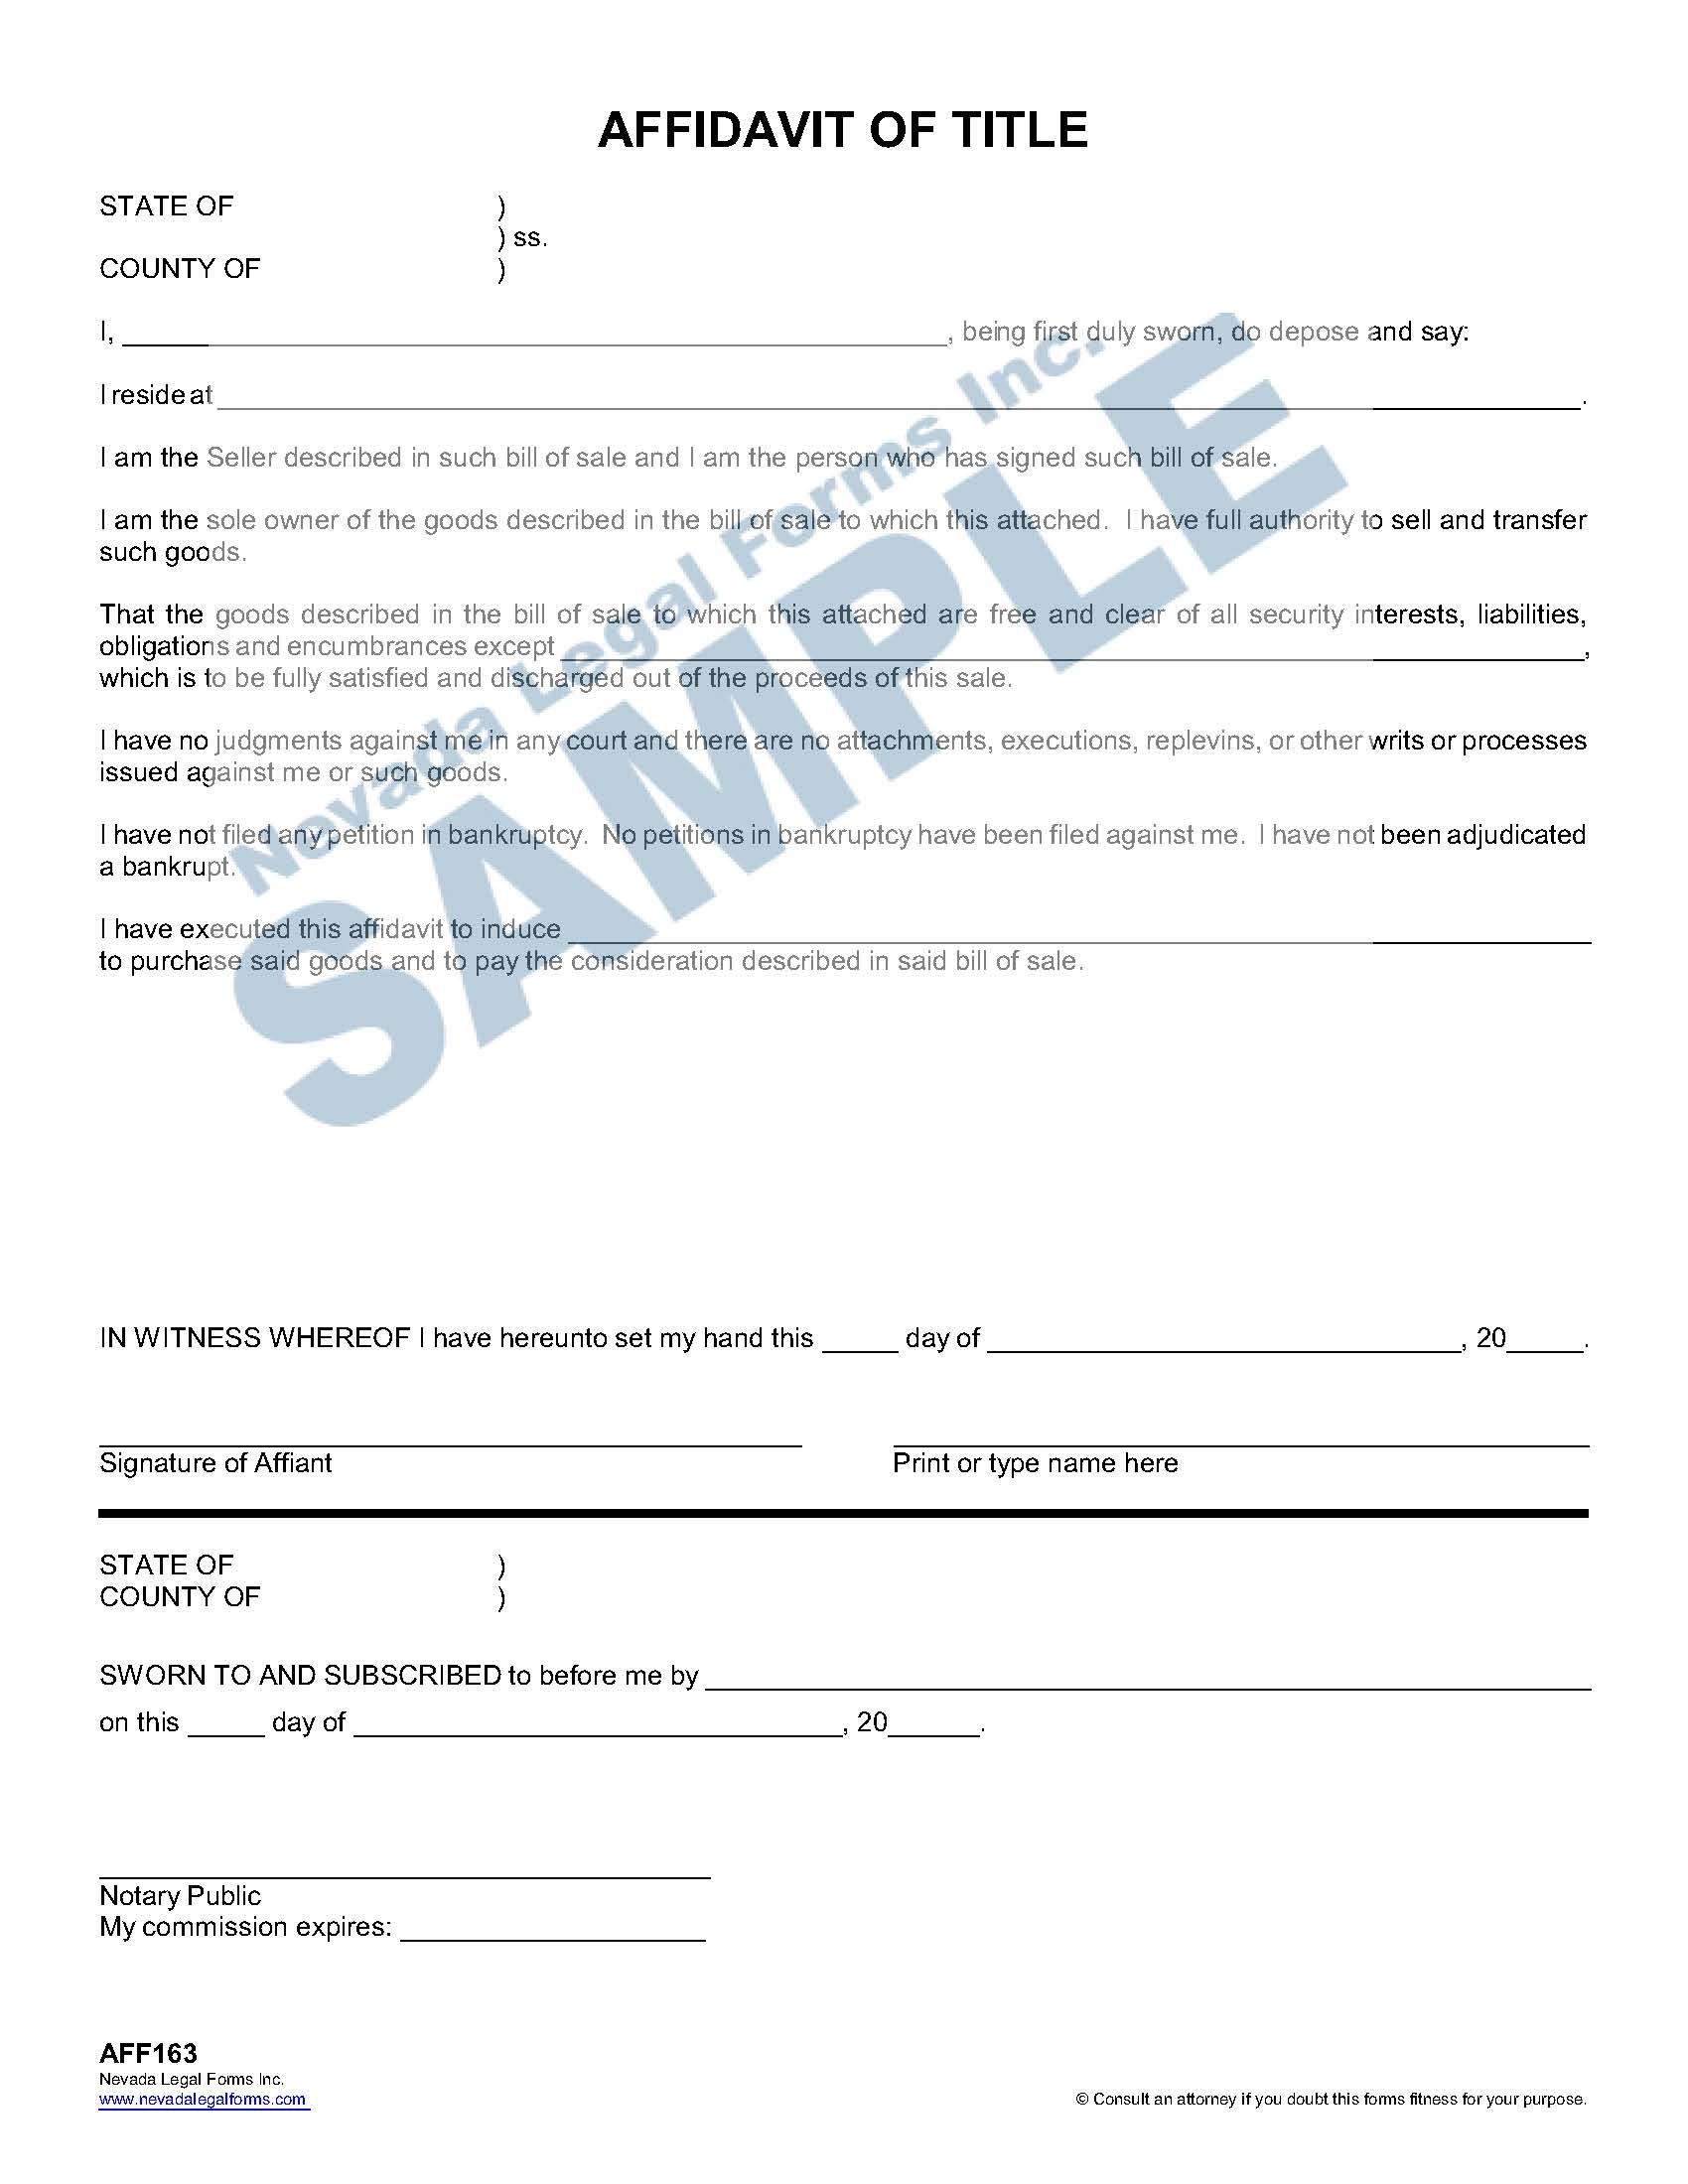 Affidavit Of Title